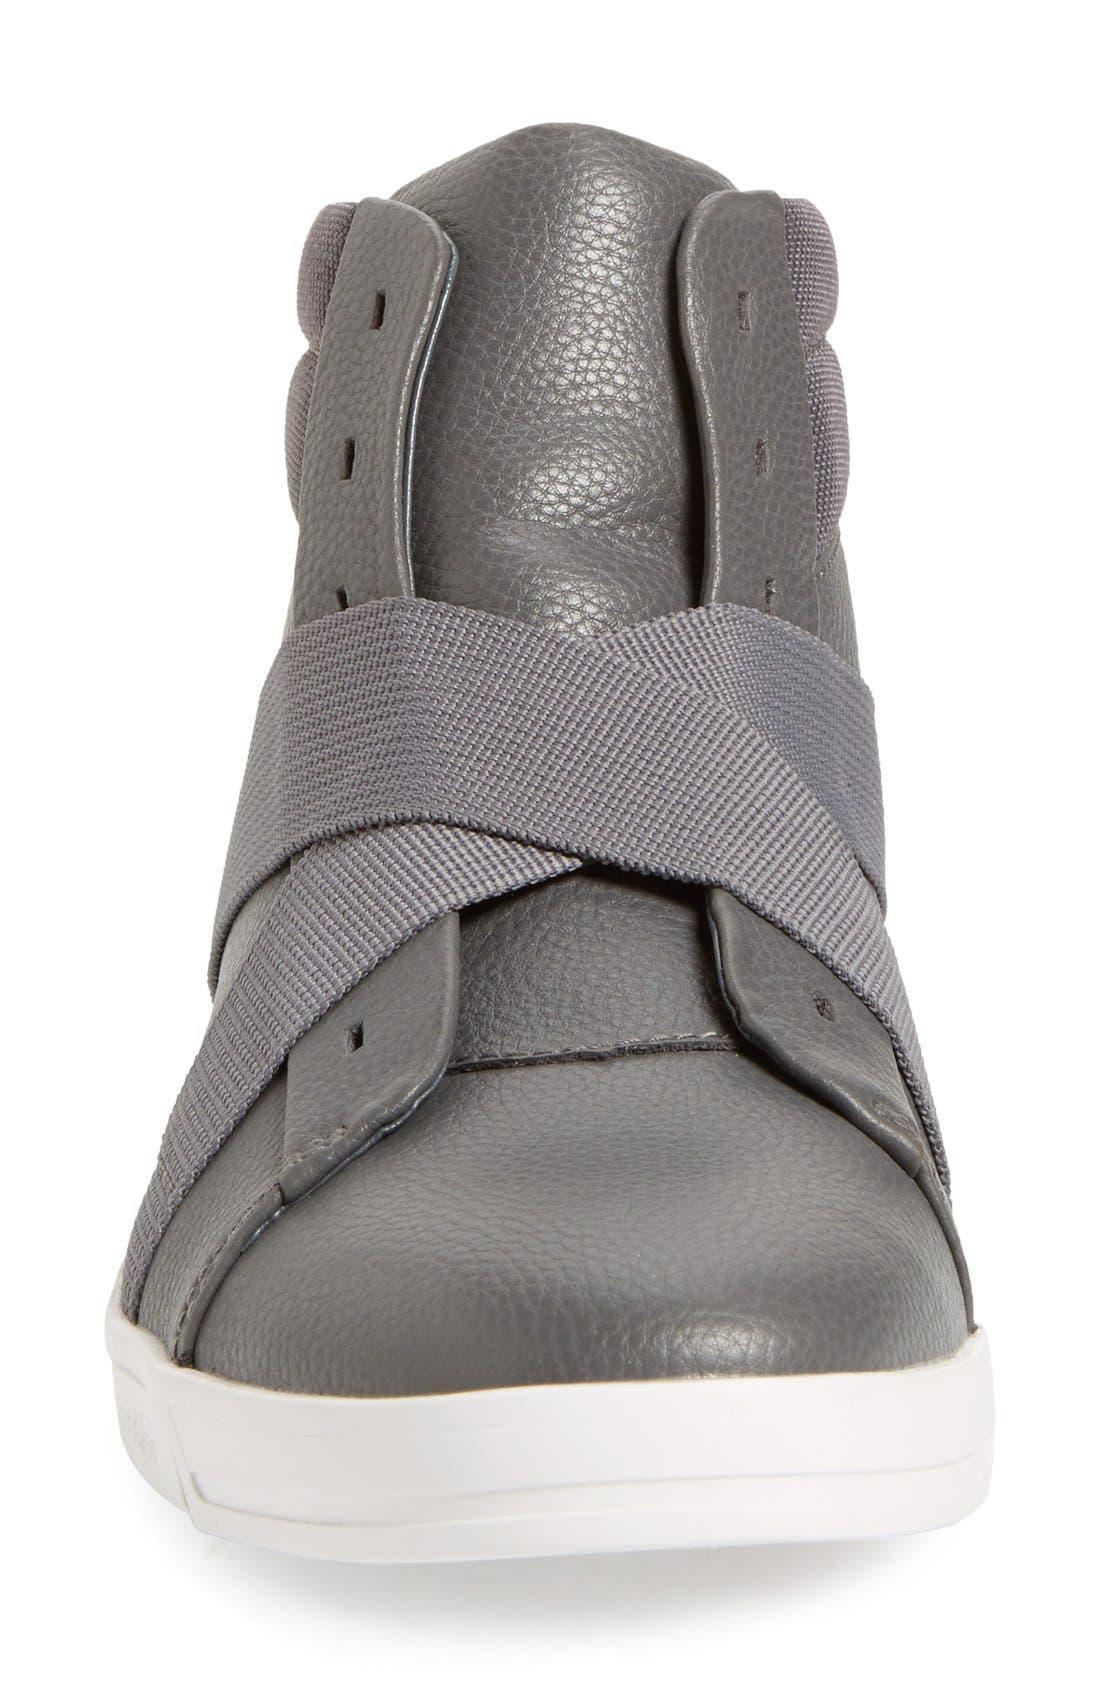 Alternate Image 3  - Calvin Klein 'Banjo' High Top Sneaker (Men)